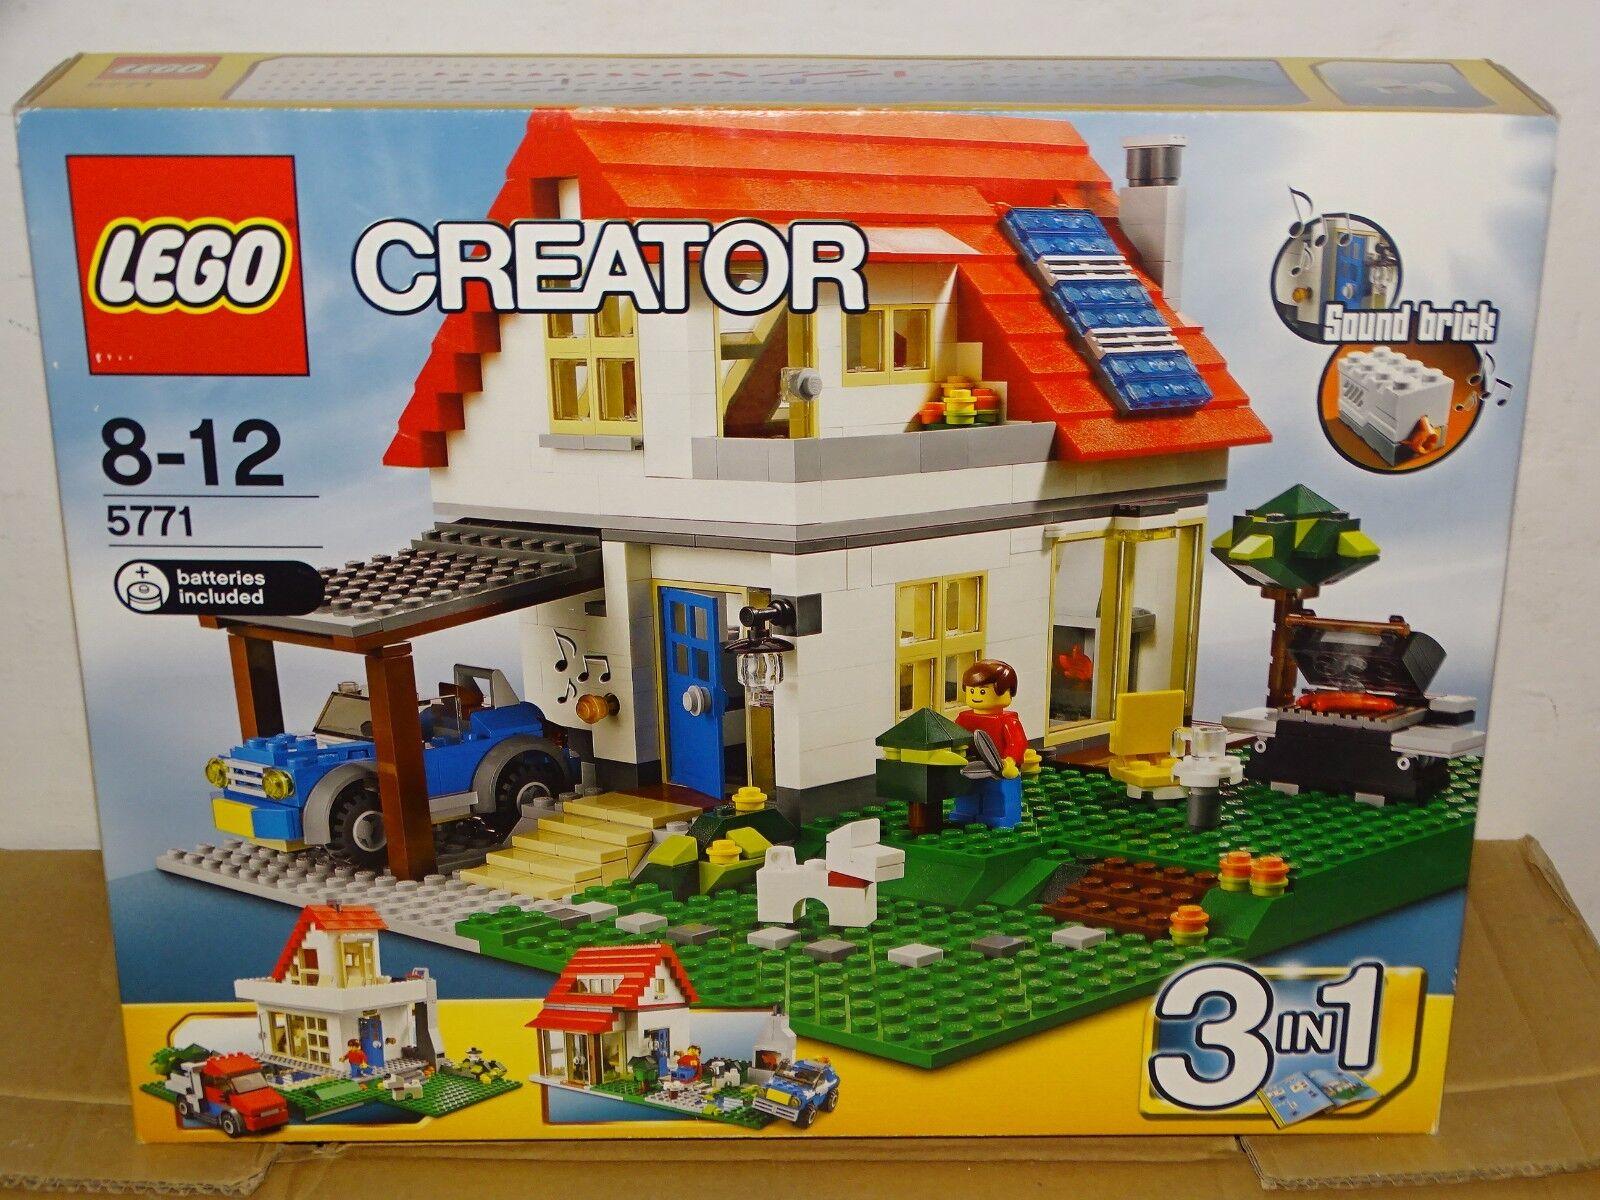 LEGO 5771 CREATOR HILLSIDE HOUSE NEU OVP MISB